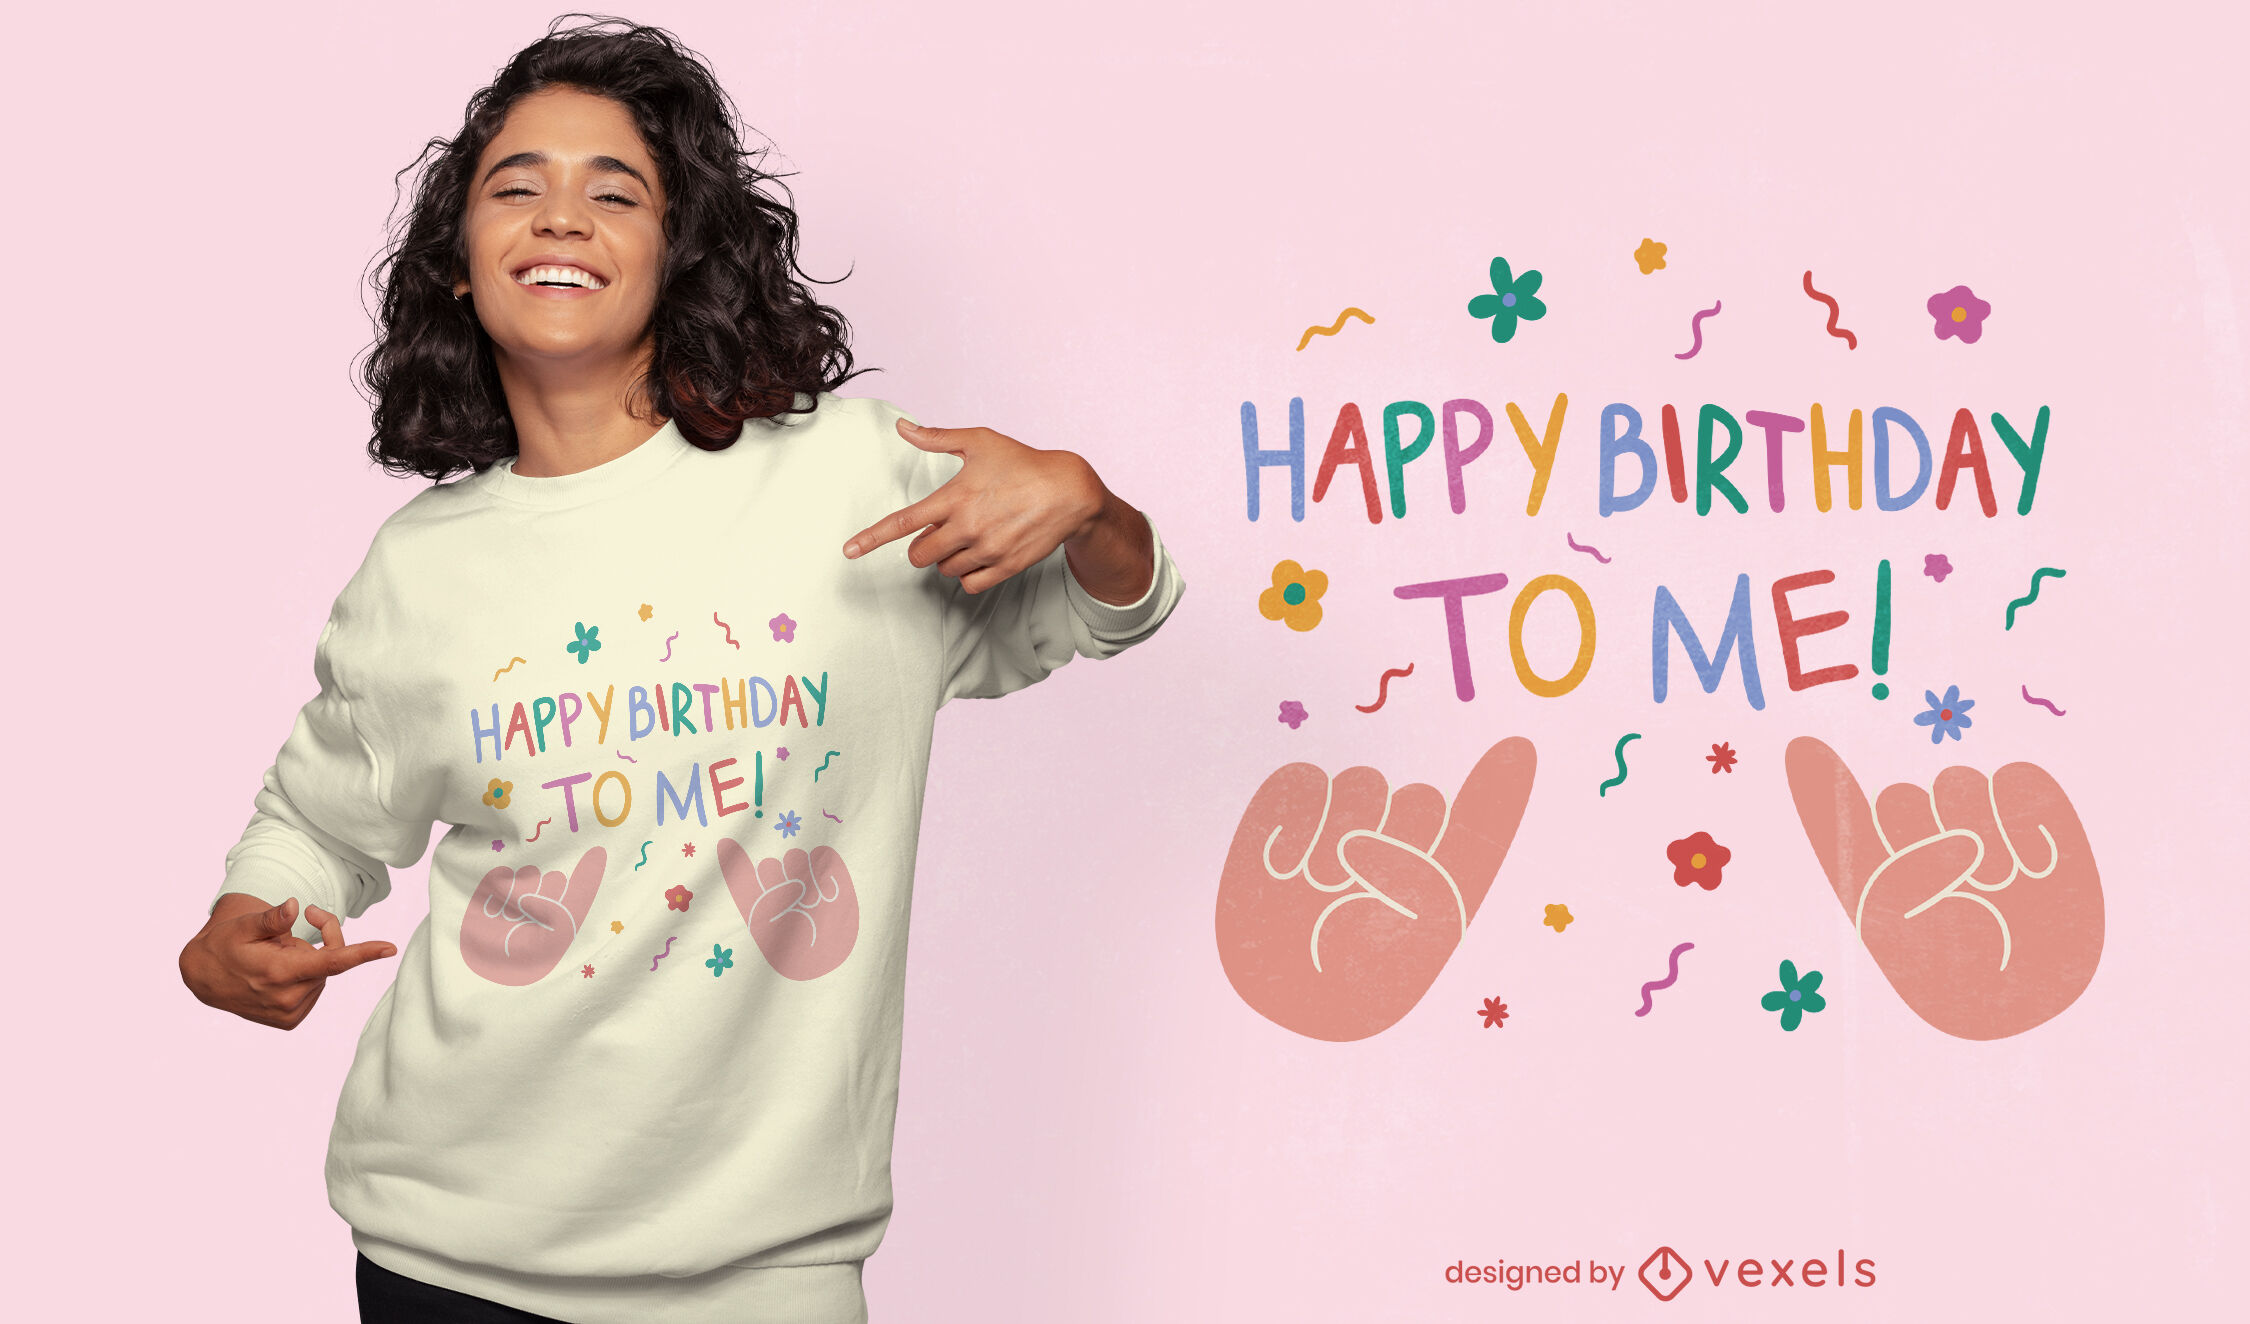 Feliz cumpleaños diseño de camiseta